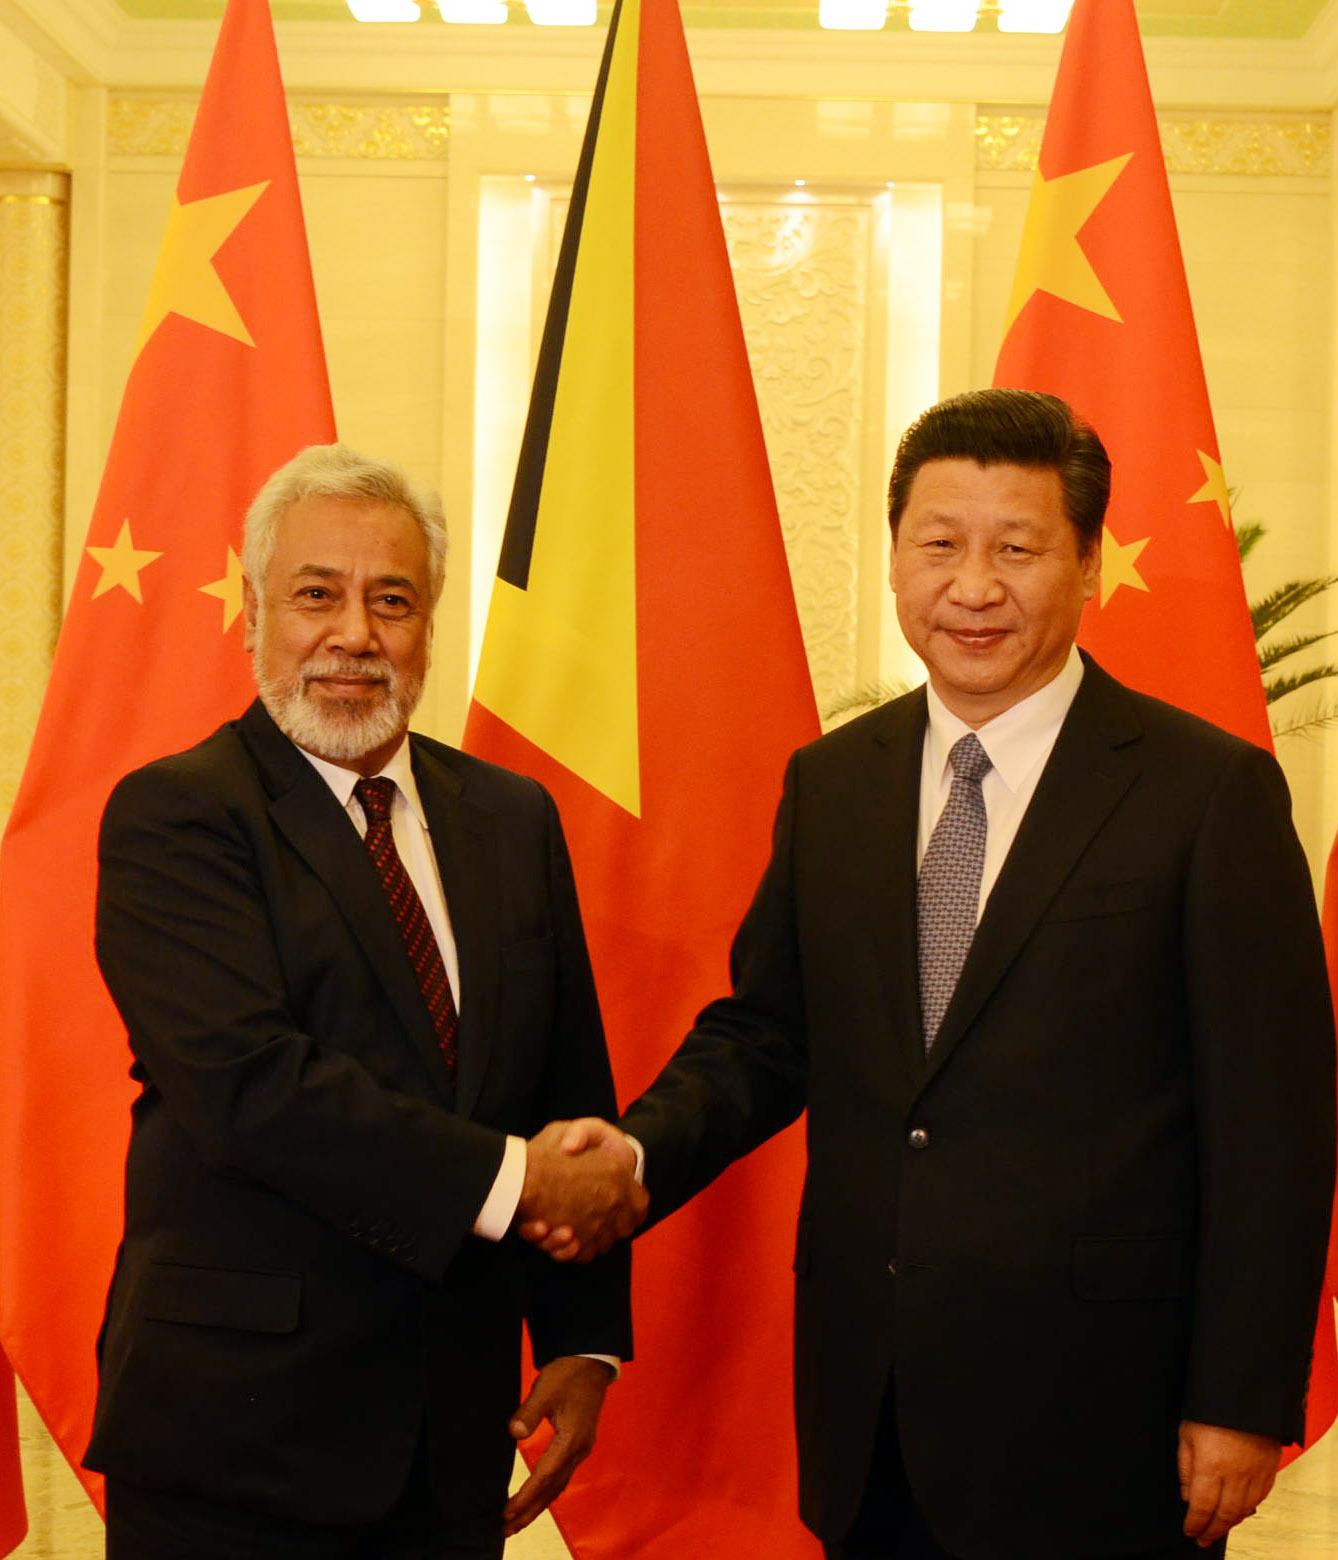 PM XG with President of China Xi Jinping.jpg